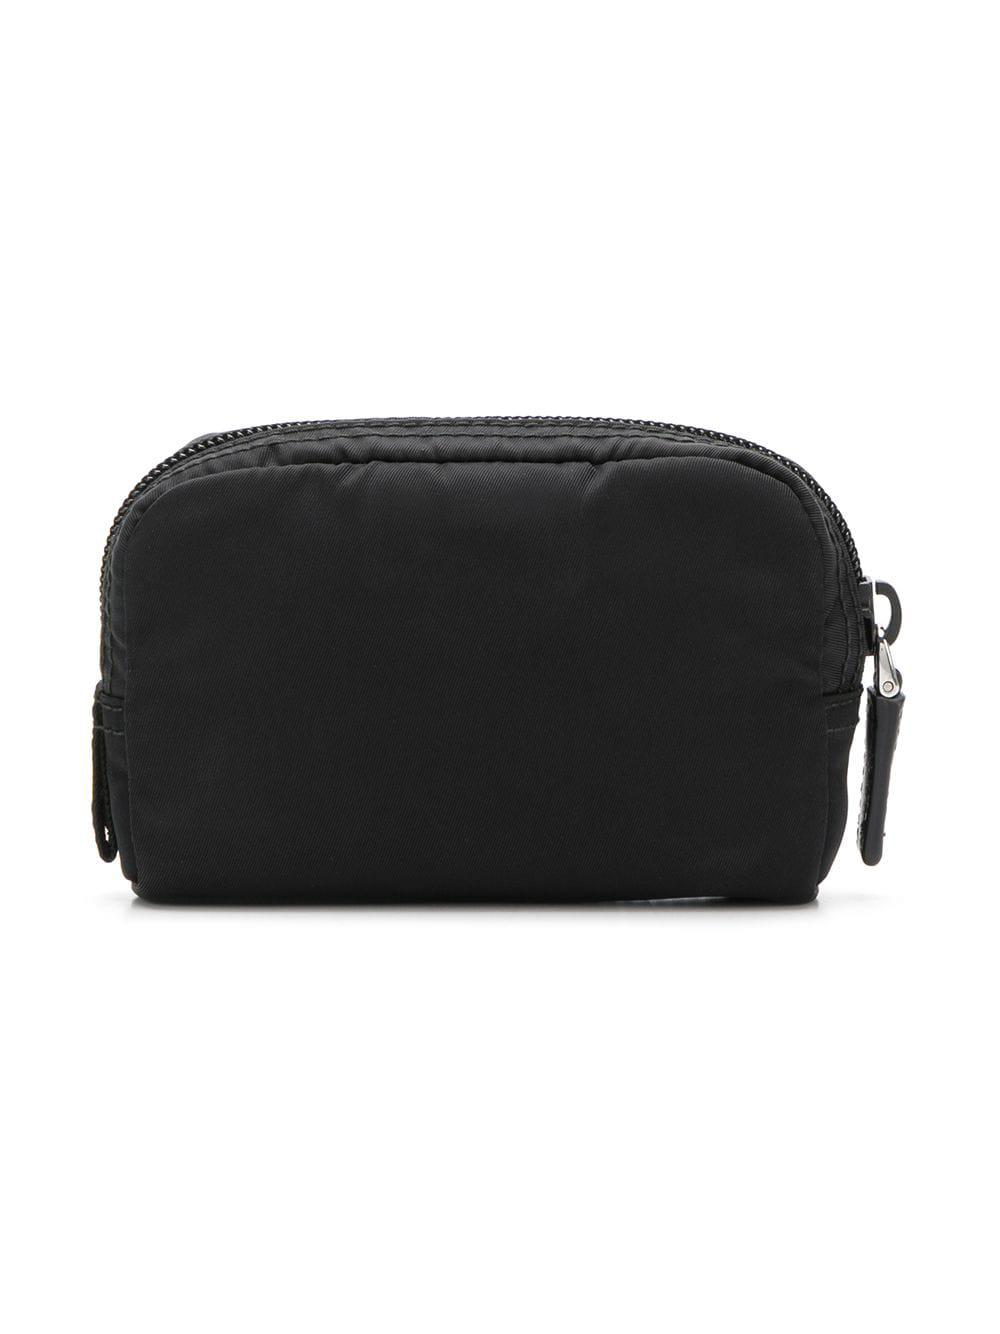 d90e80df3e Prada - Black Fabric Cosmetic Pouch - Lyst. View fullscreen